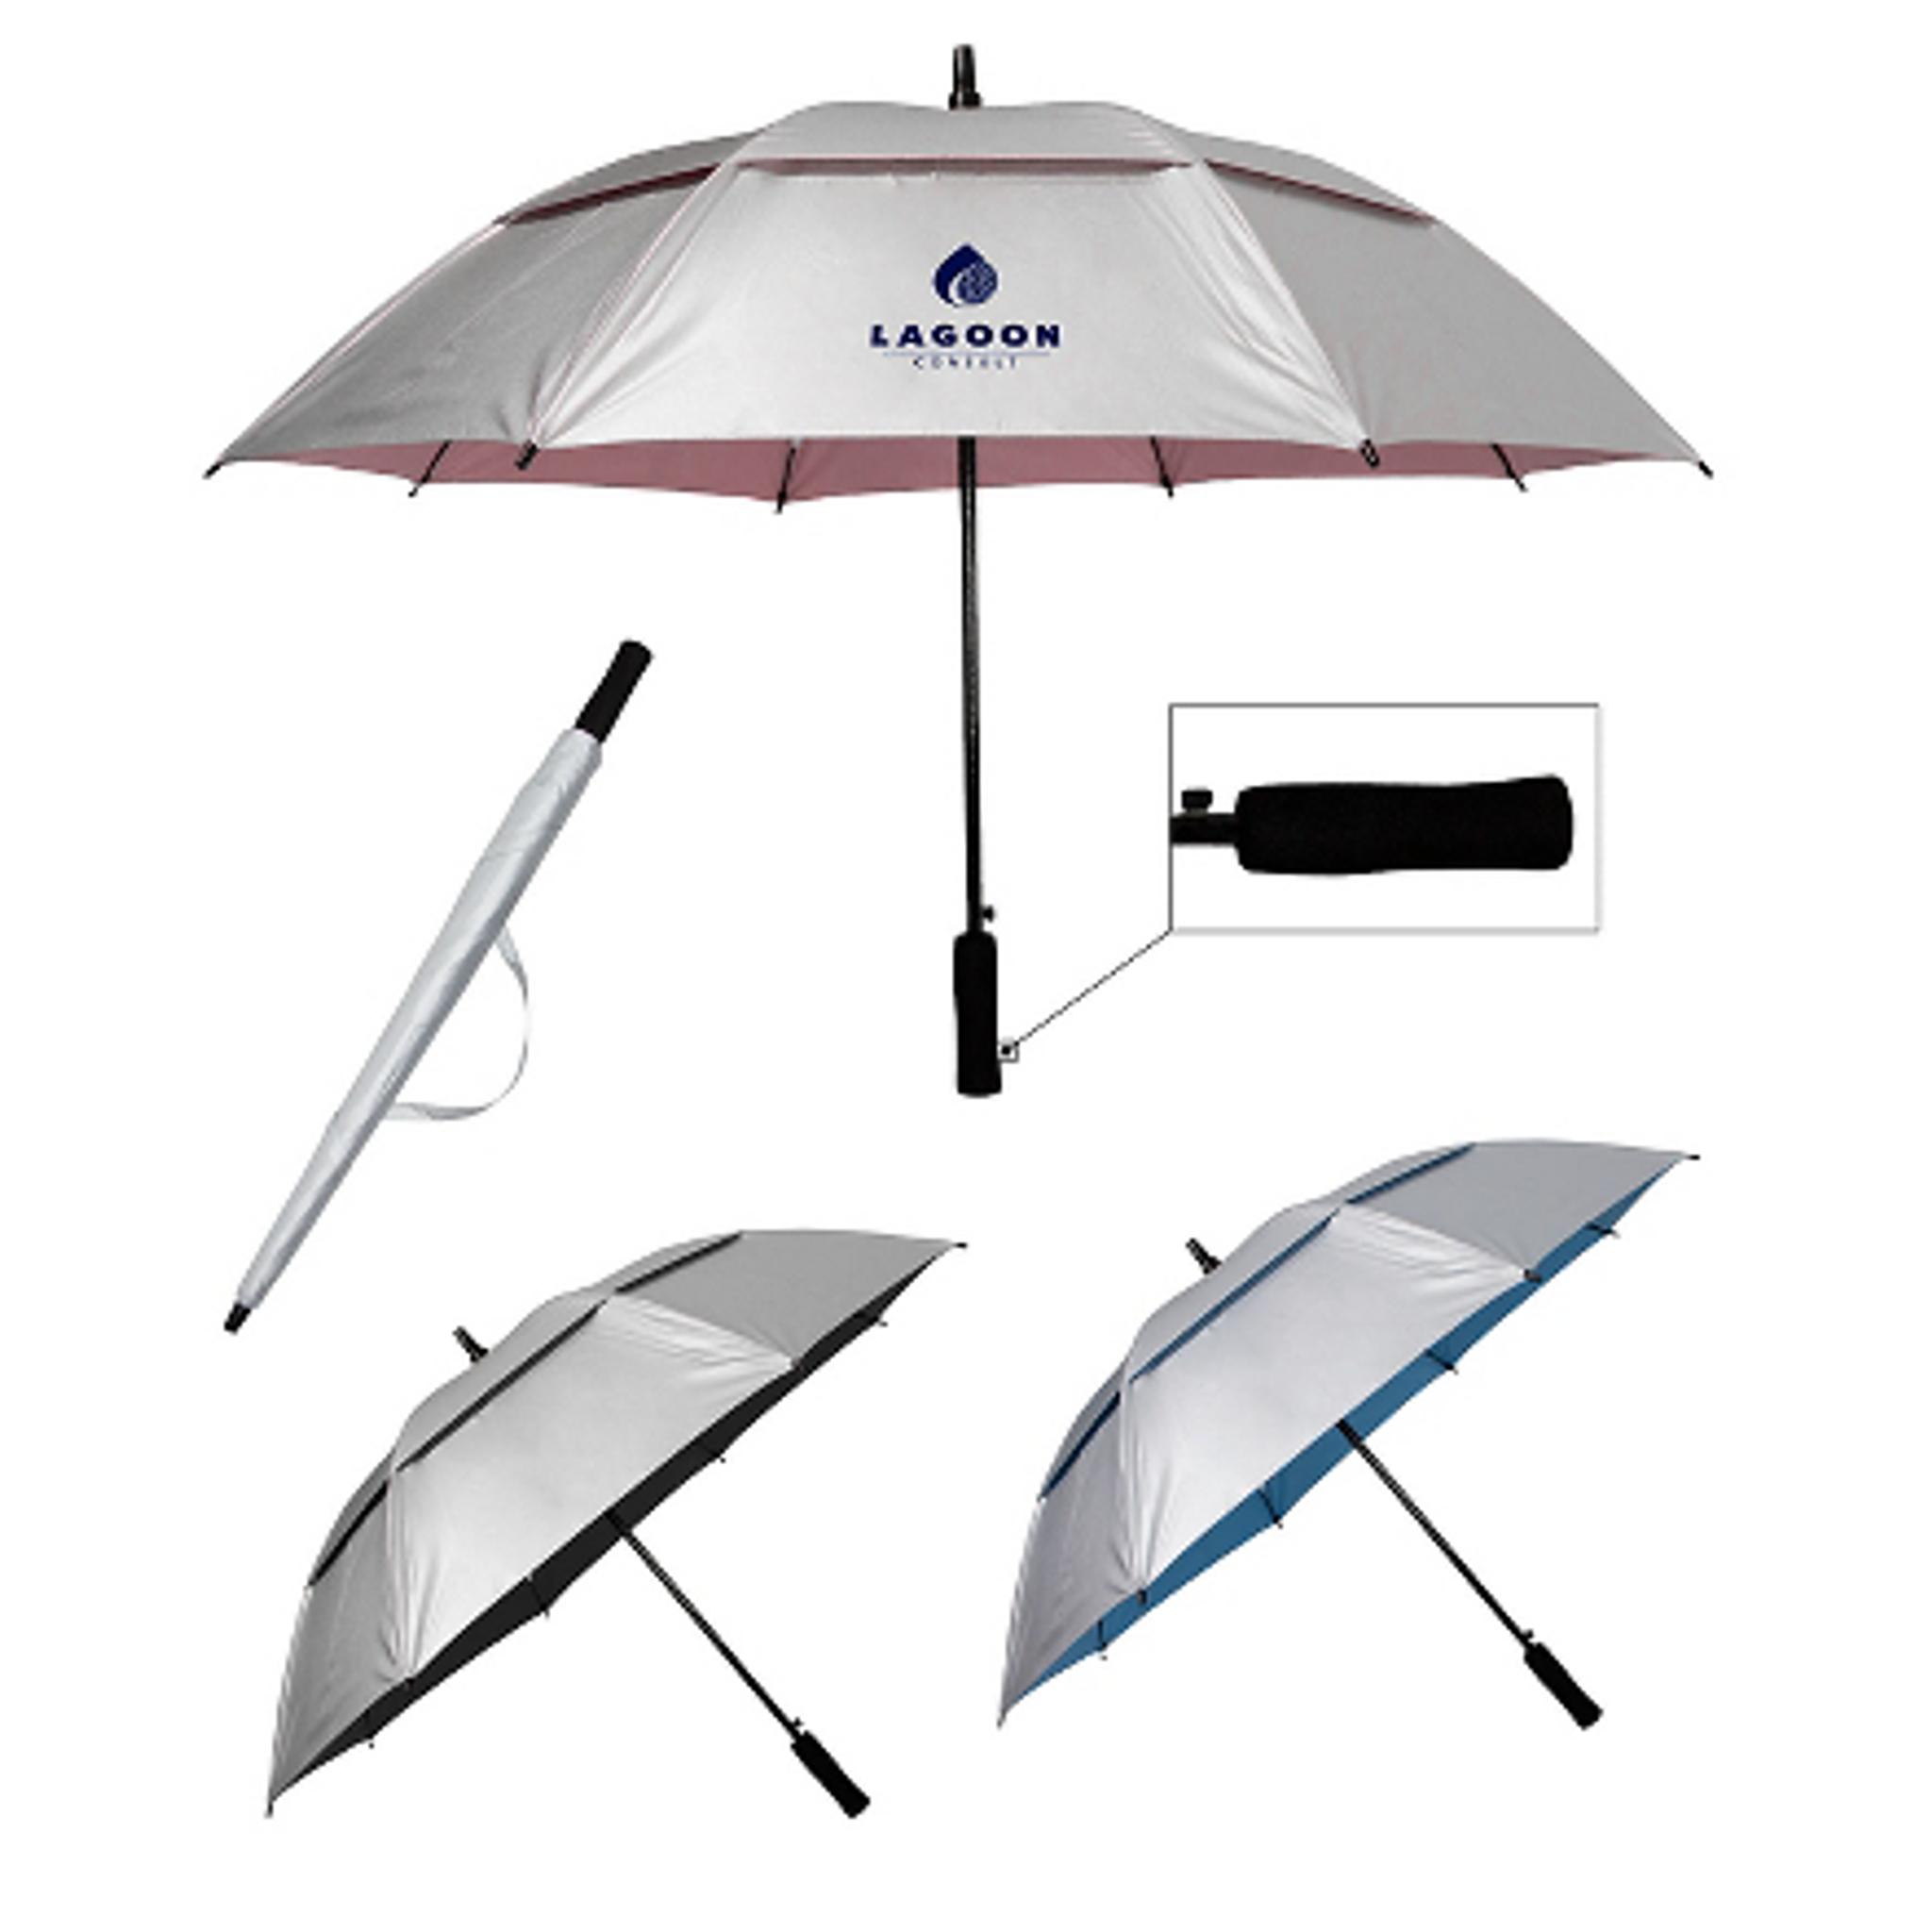 b12d69c31ee9 Sunbuster Golf Umbrella